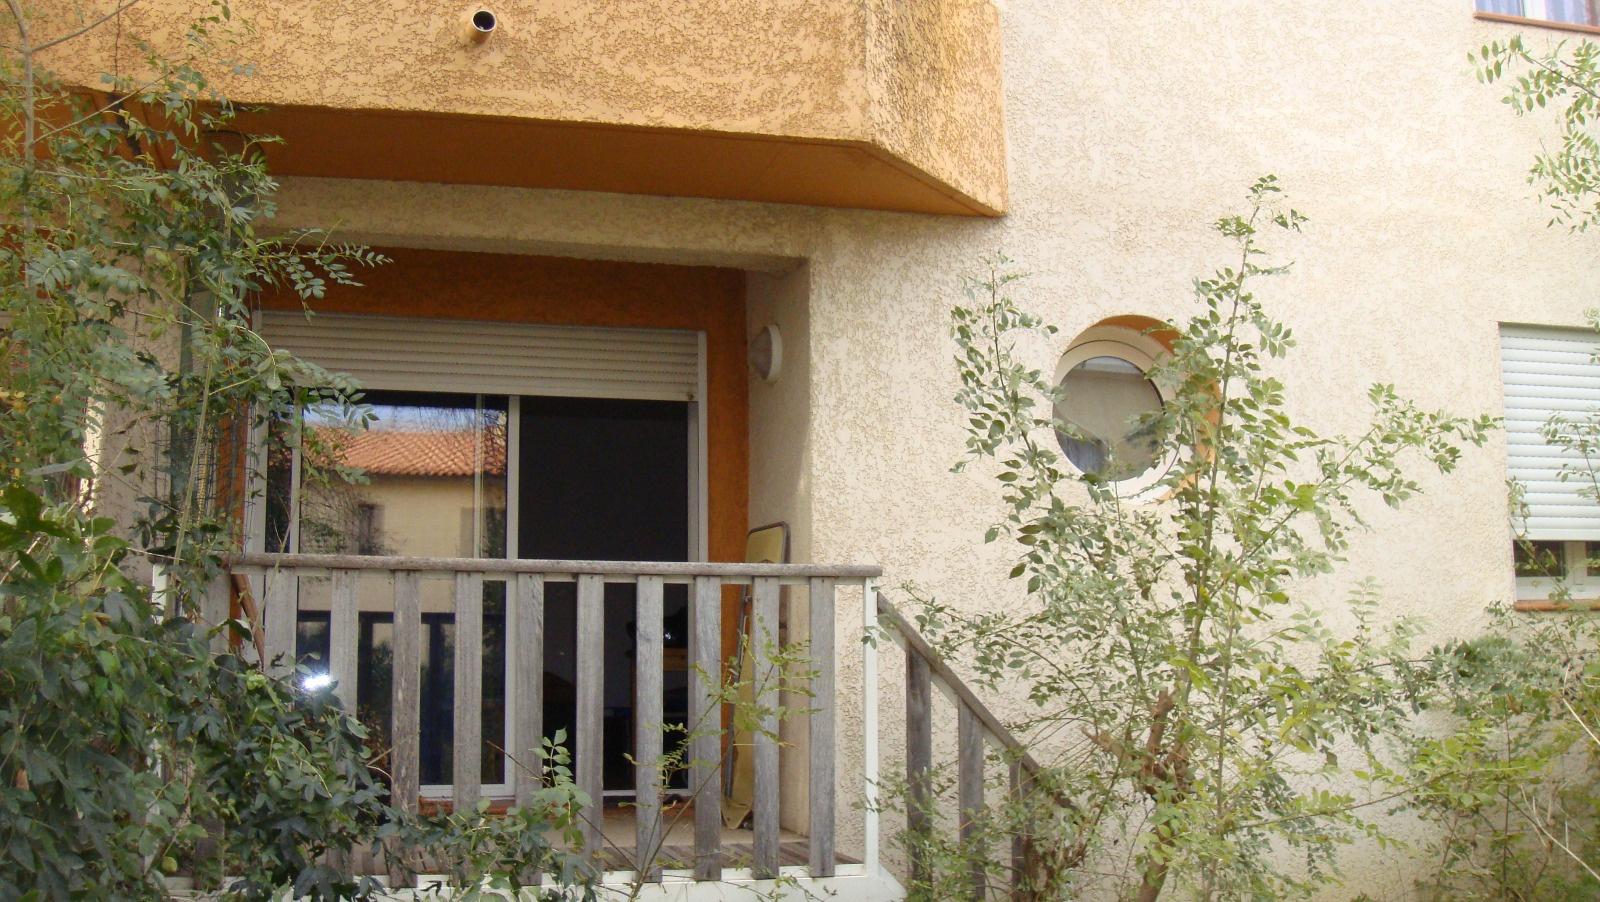 vente perpignan st gaud rique appartement t2 avec jardin. Black Bedroom Furniture Sets. Home Design Ideas